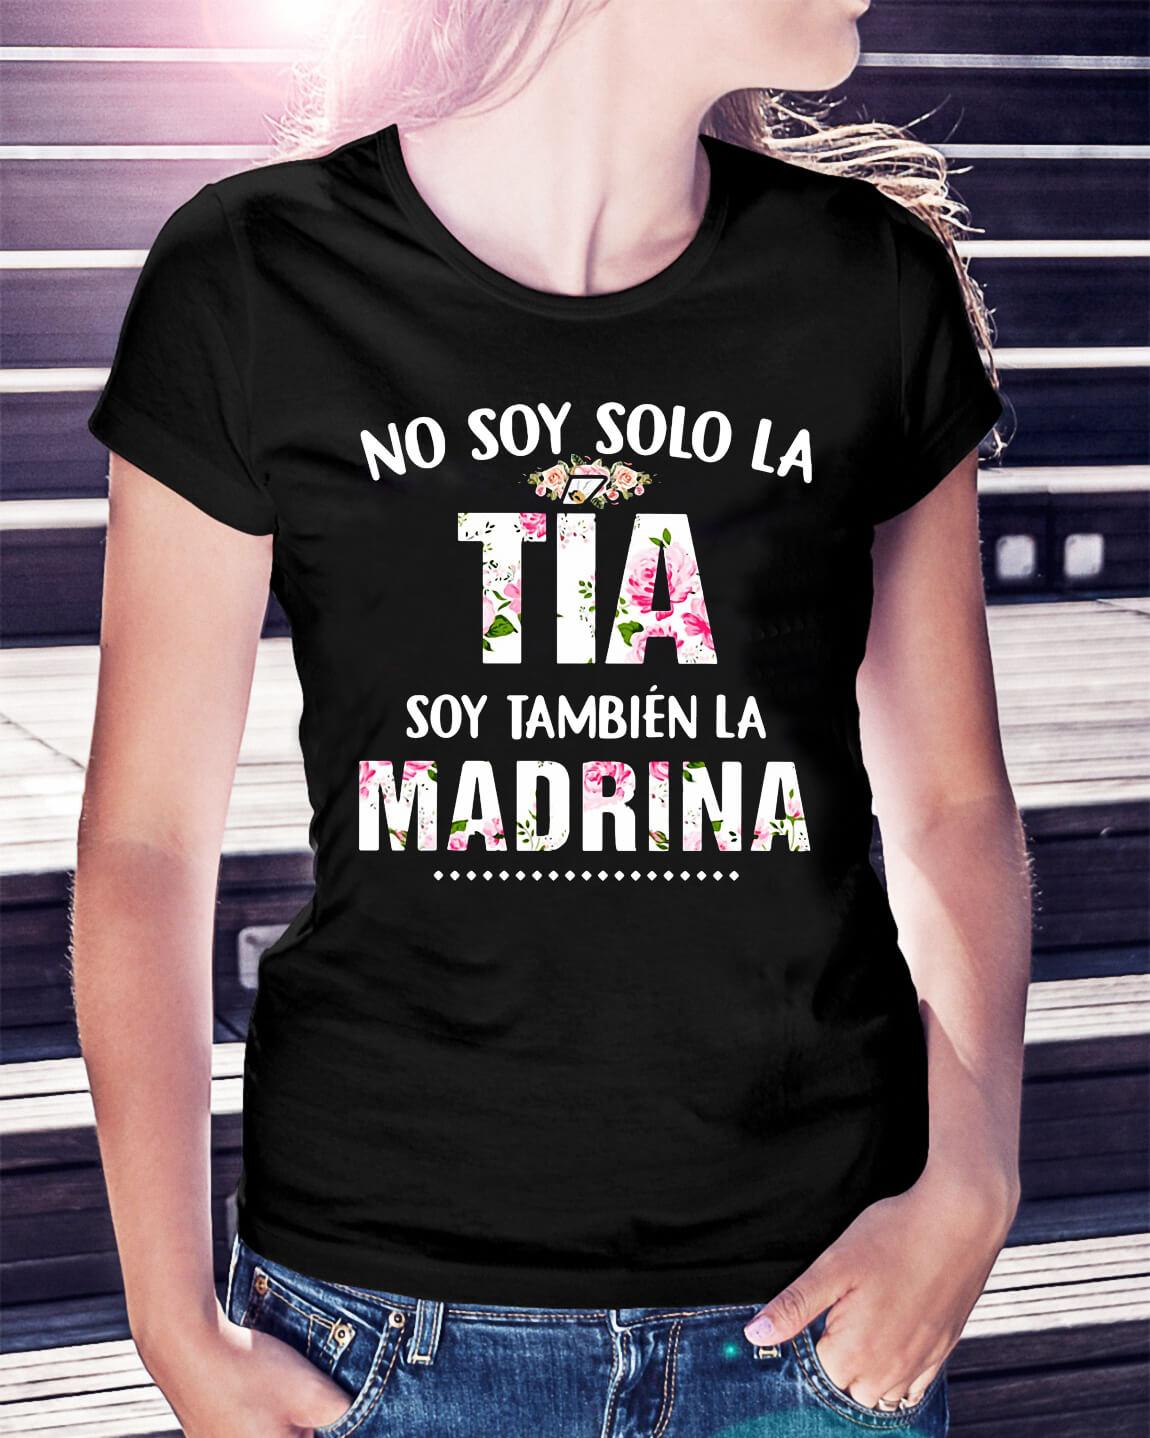 4658f596a7f11 No soy solo la Tia soy Tambien la Madrina shirt, hoodie, sweater